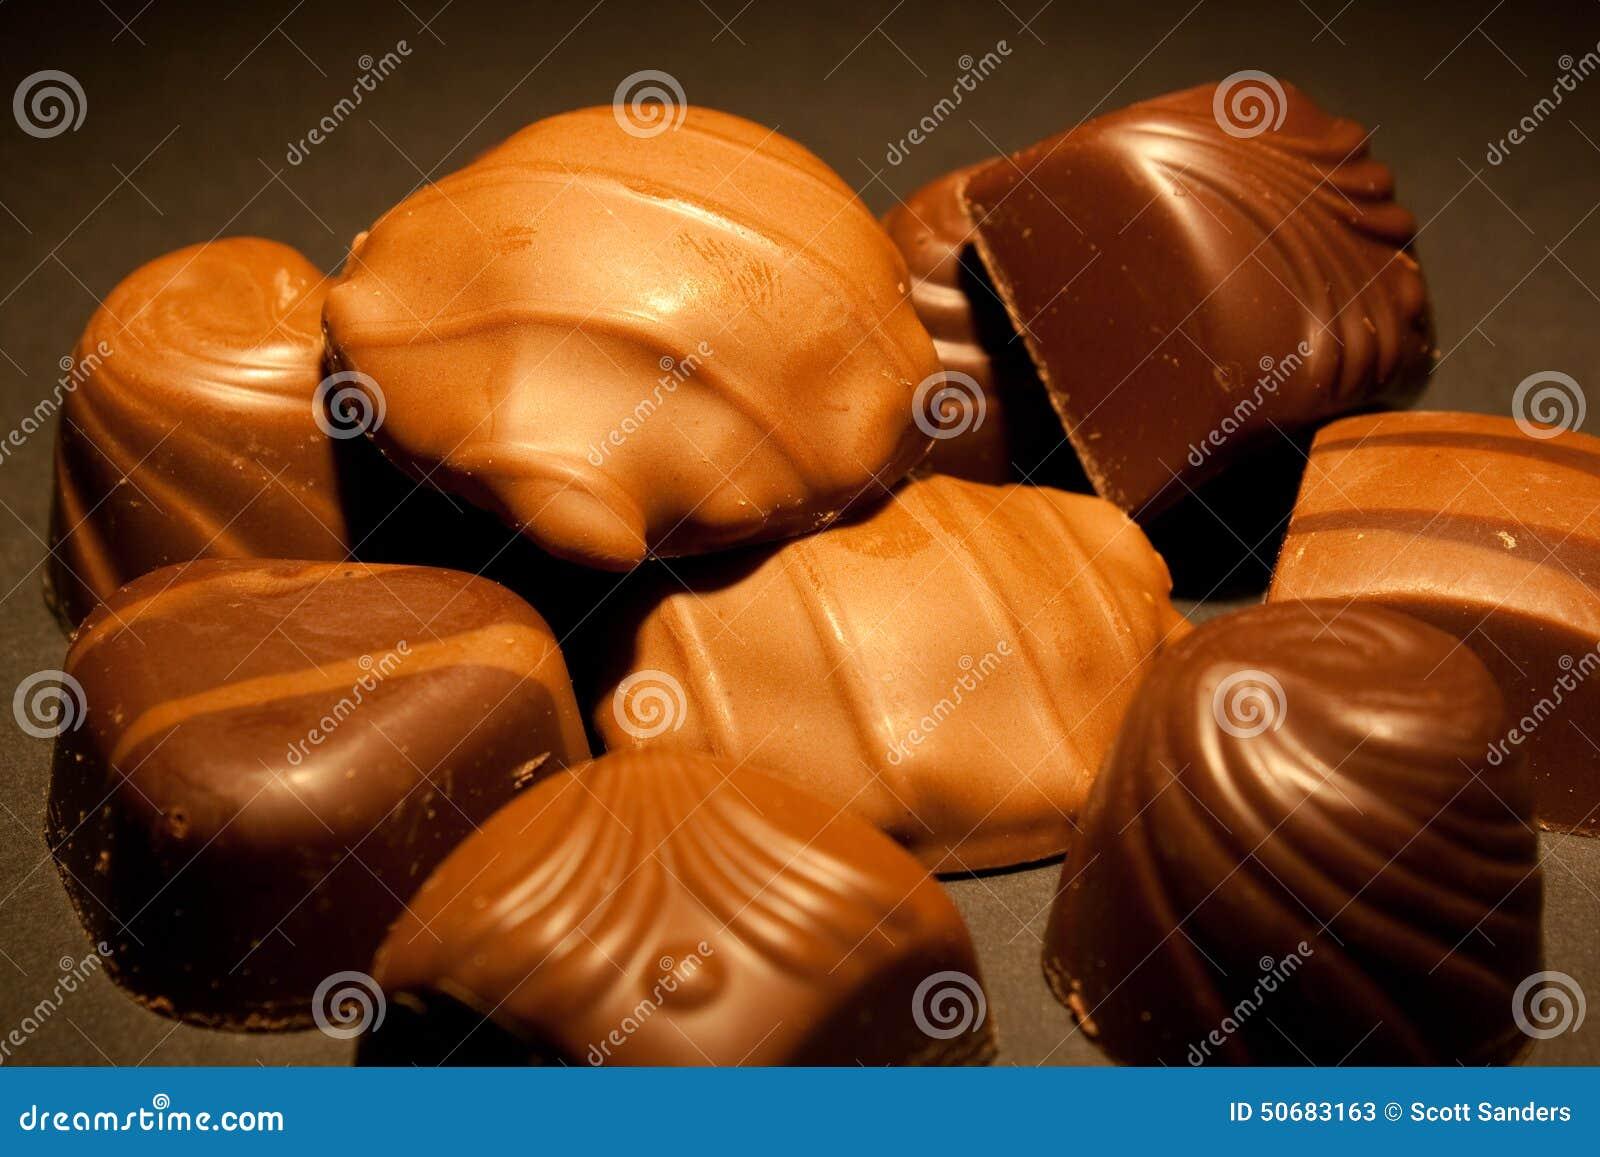 Download 巧克力 库存图片. 图片 包括有 糖果, browne, 款待, 关闭, 鲜美, 可口, 巧克力, 点心 - 50683163